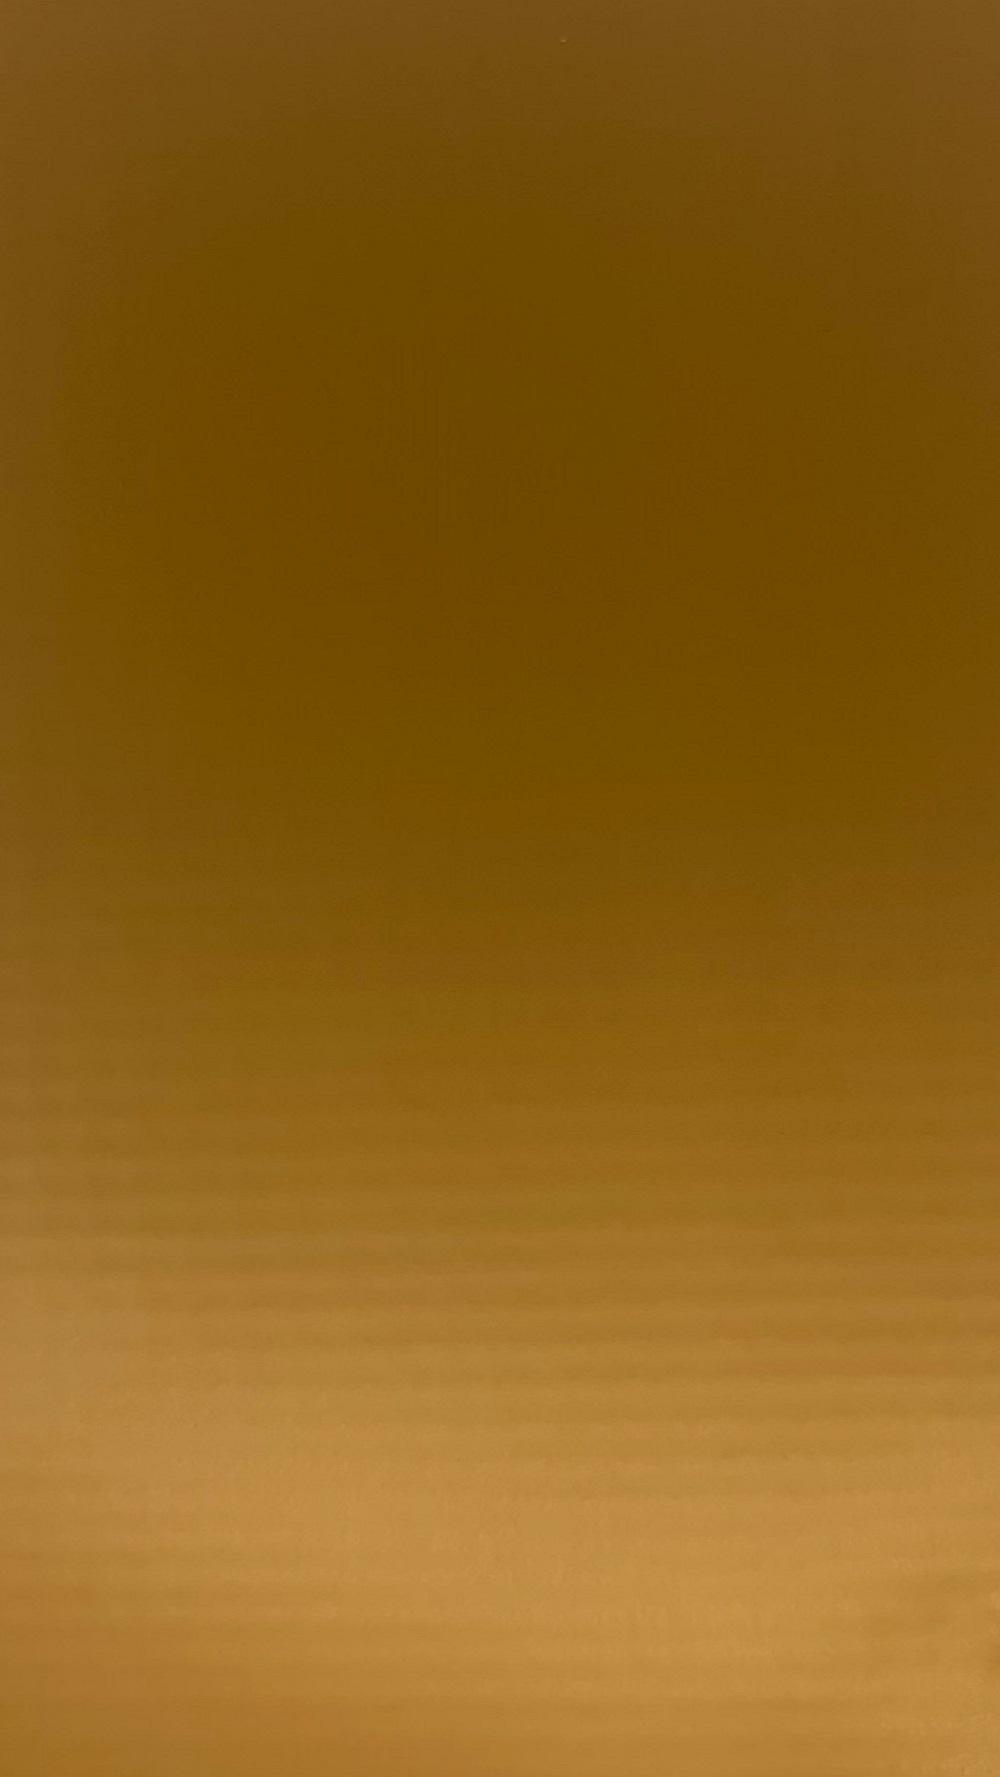 Lona Vinilona Df Fosca Marrom S-161 1,45mt X 50,0mts